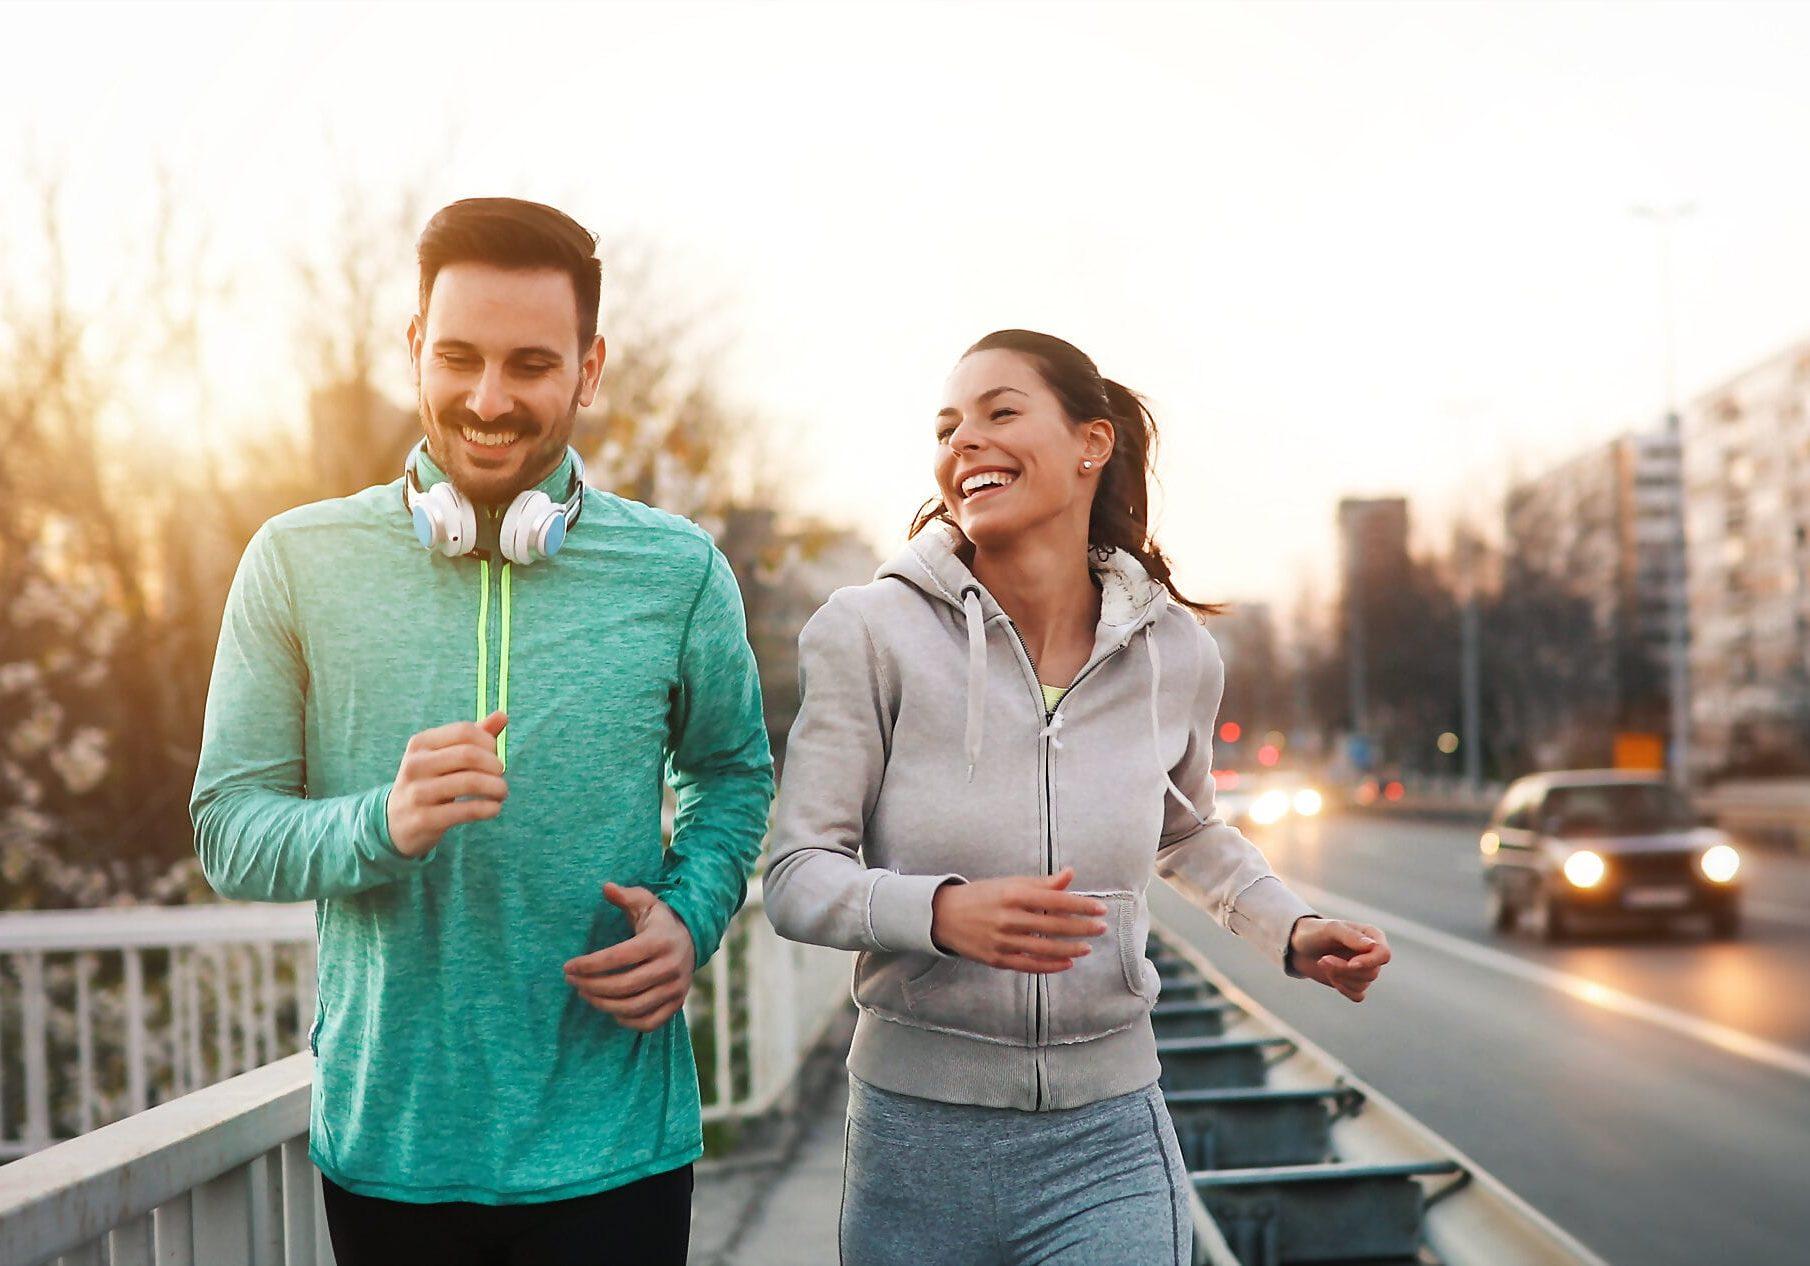 corovital-mettmann-opladen-leverkusen-praxis-sportmedizin-joggen-laufen-lachen-gesund